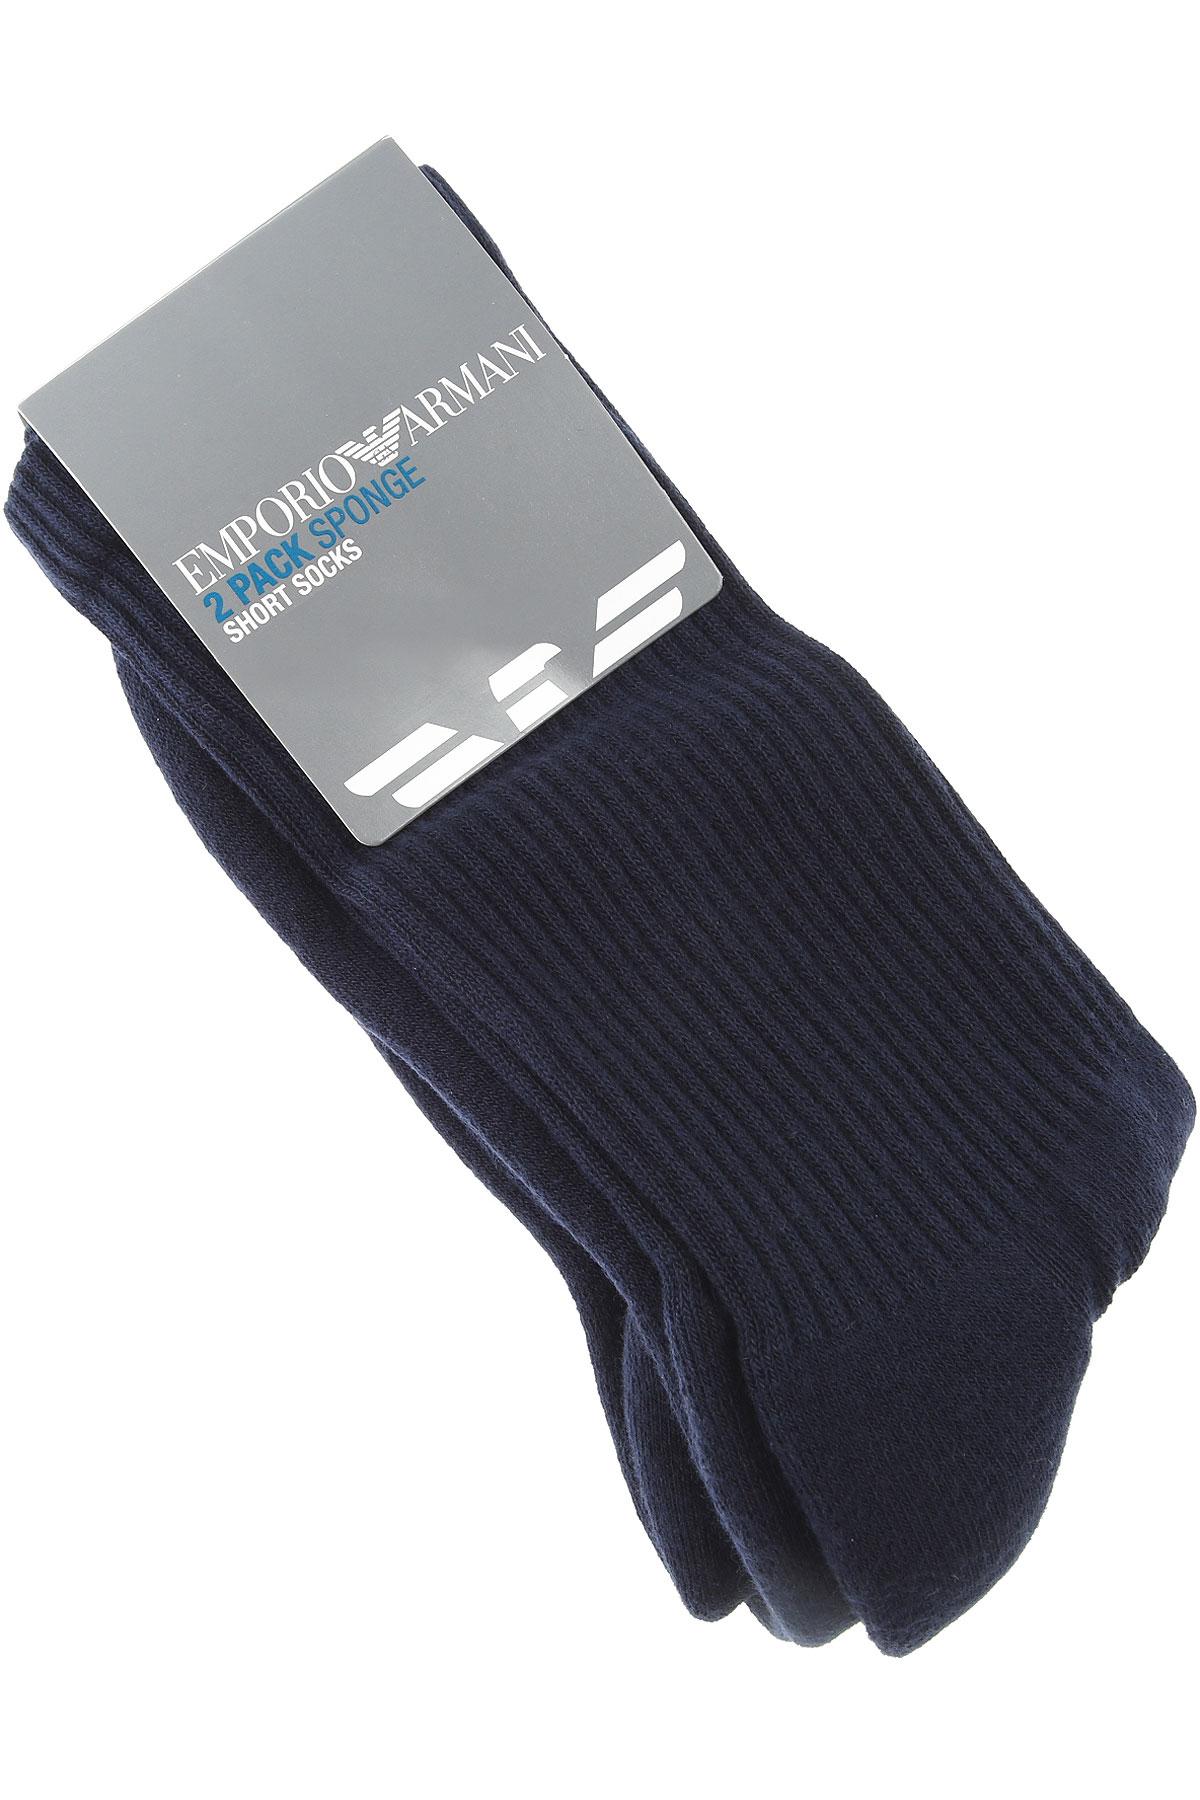 Emporio Armani Socks Socks for Men, 2 Pack, Blue Navy, Cotton, 2019, M (42-44) UK 8-9 L (45-46) UK 10-11